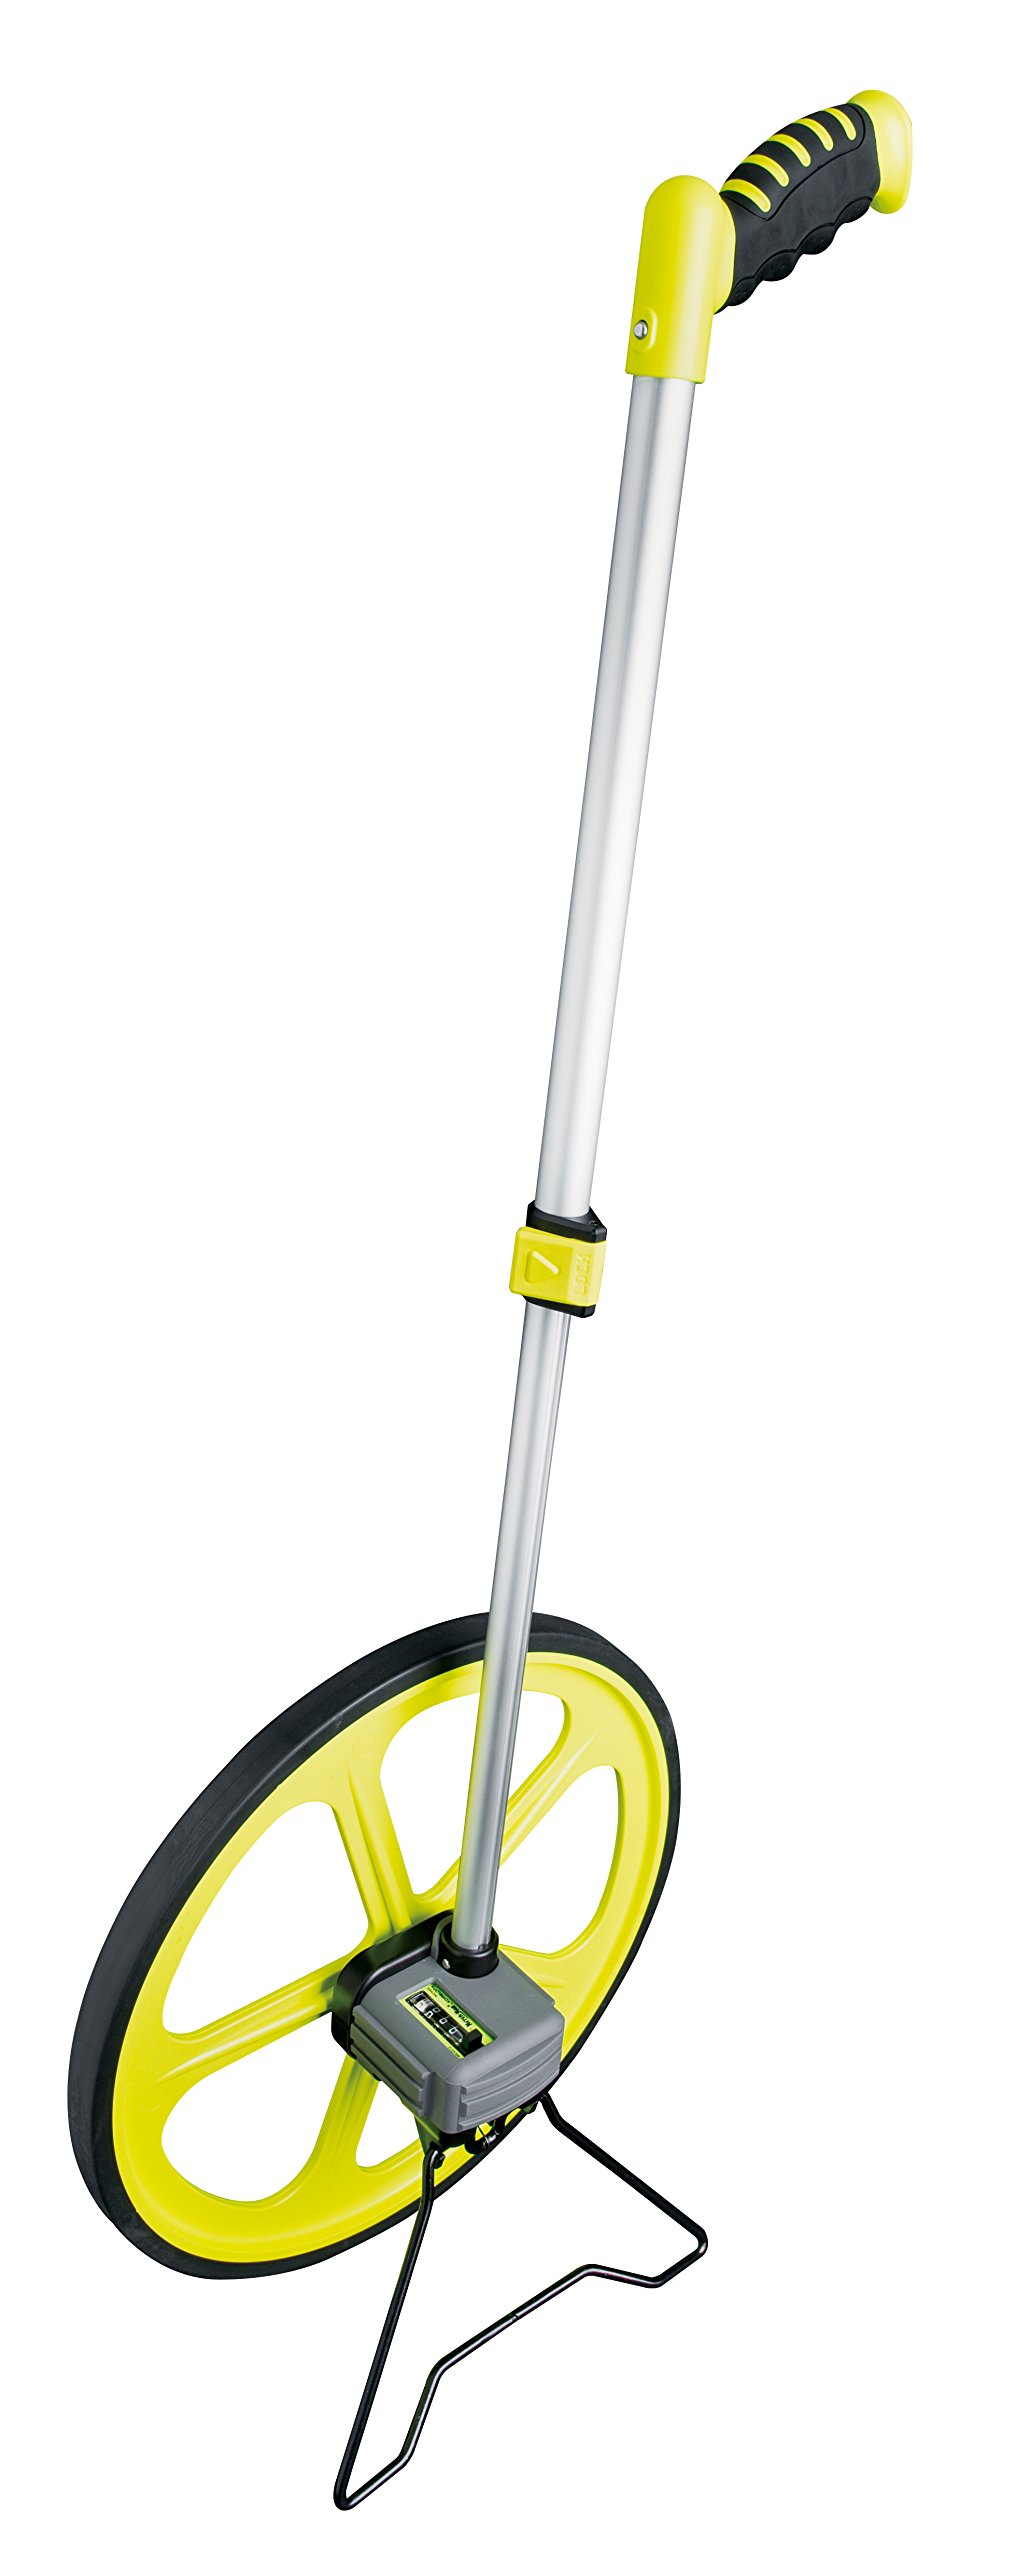 Komelon MK4512 Meter-Man 14-Inch Measuring Wheel